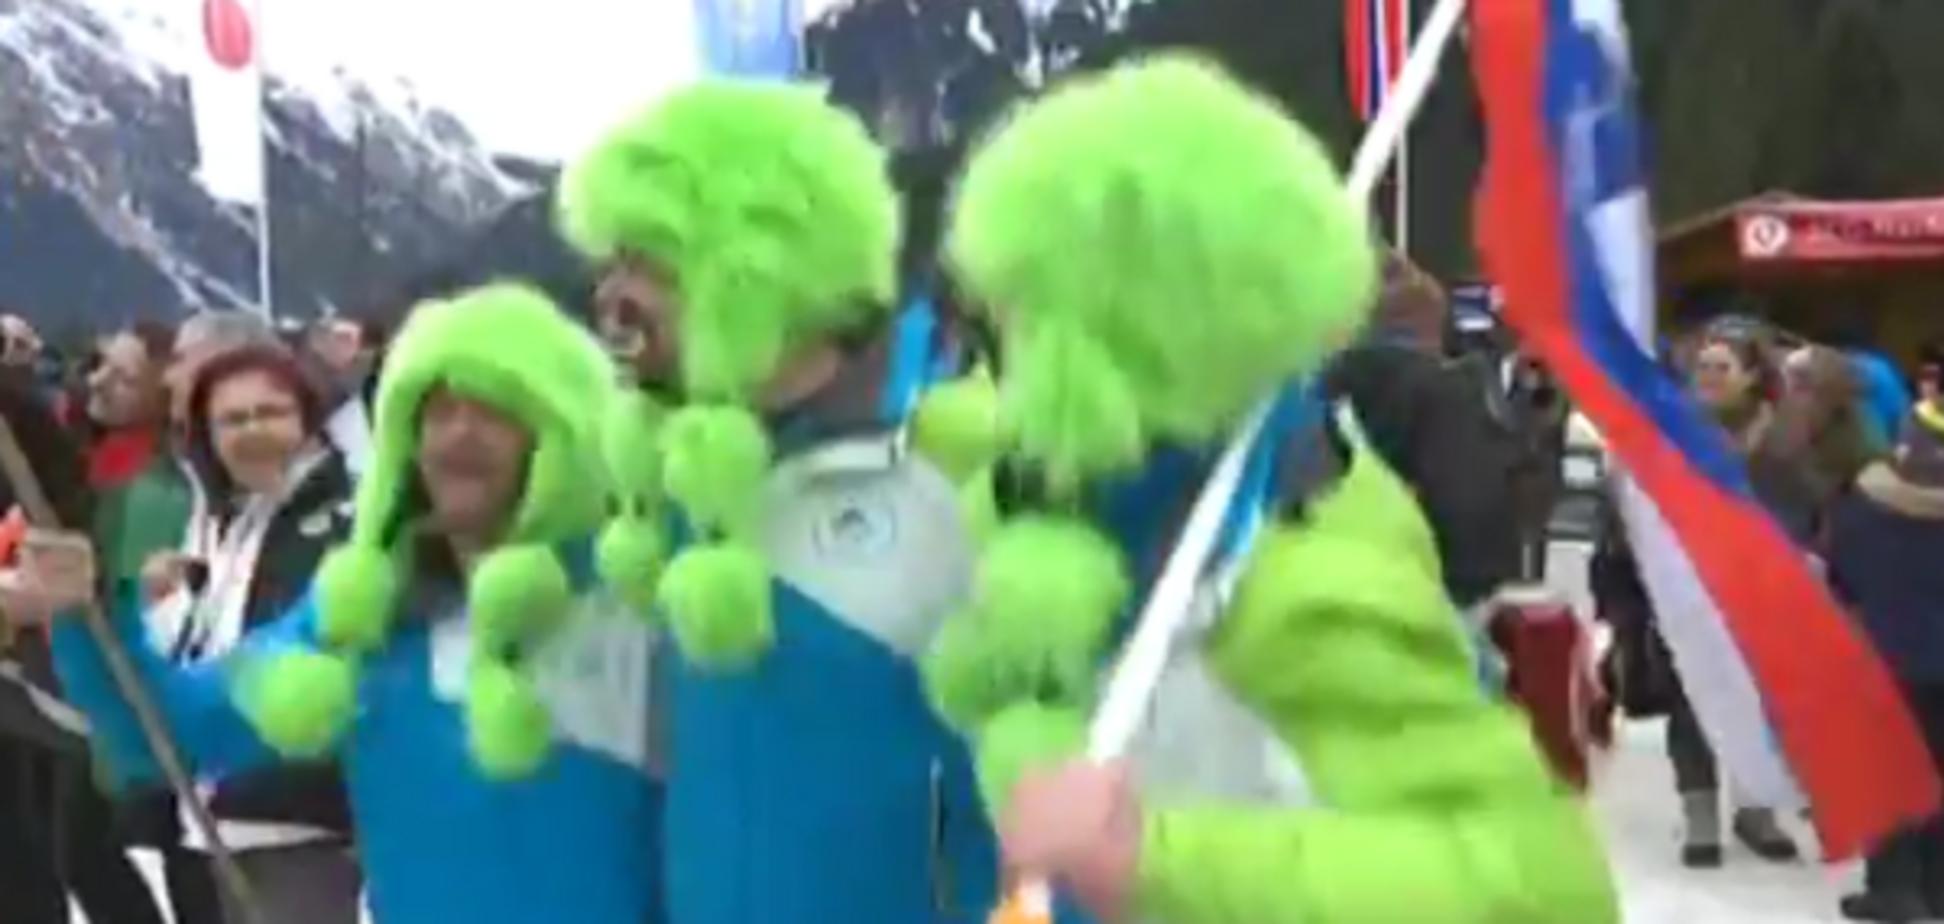 Фани збірної Словенії